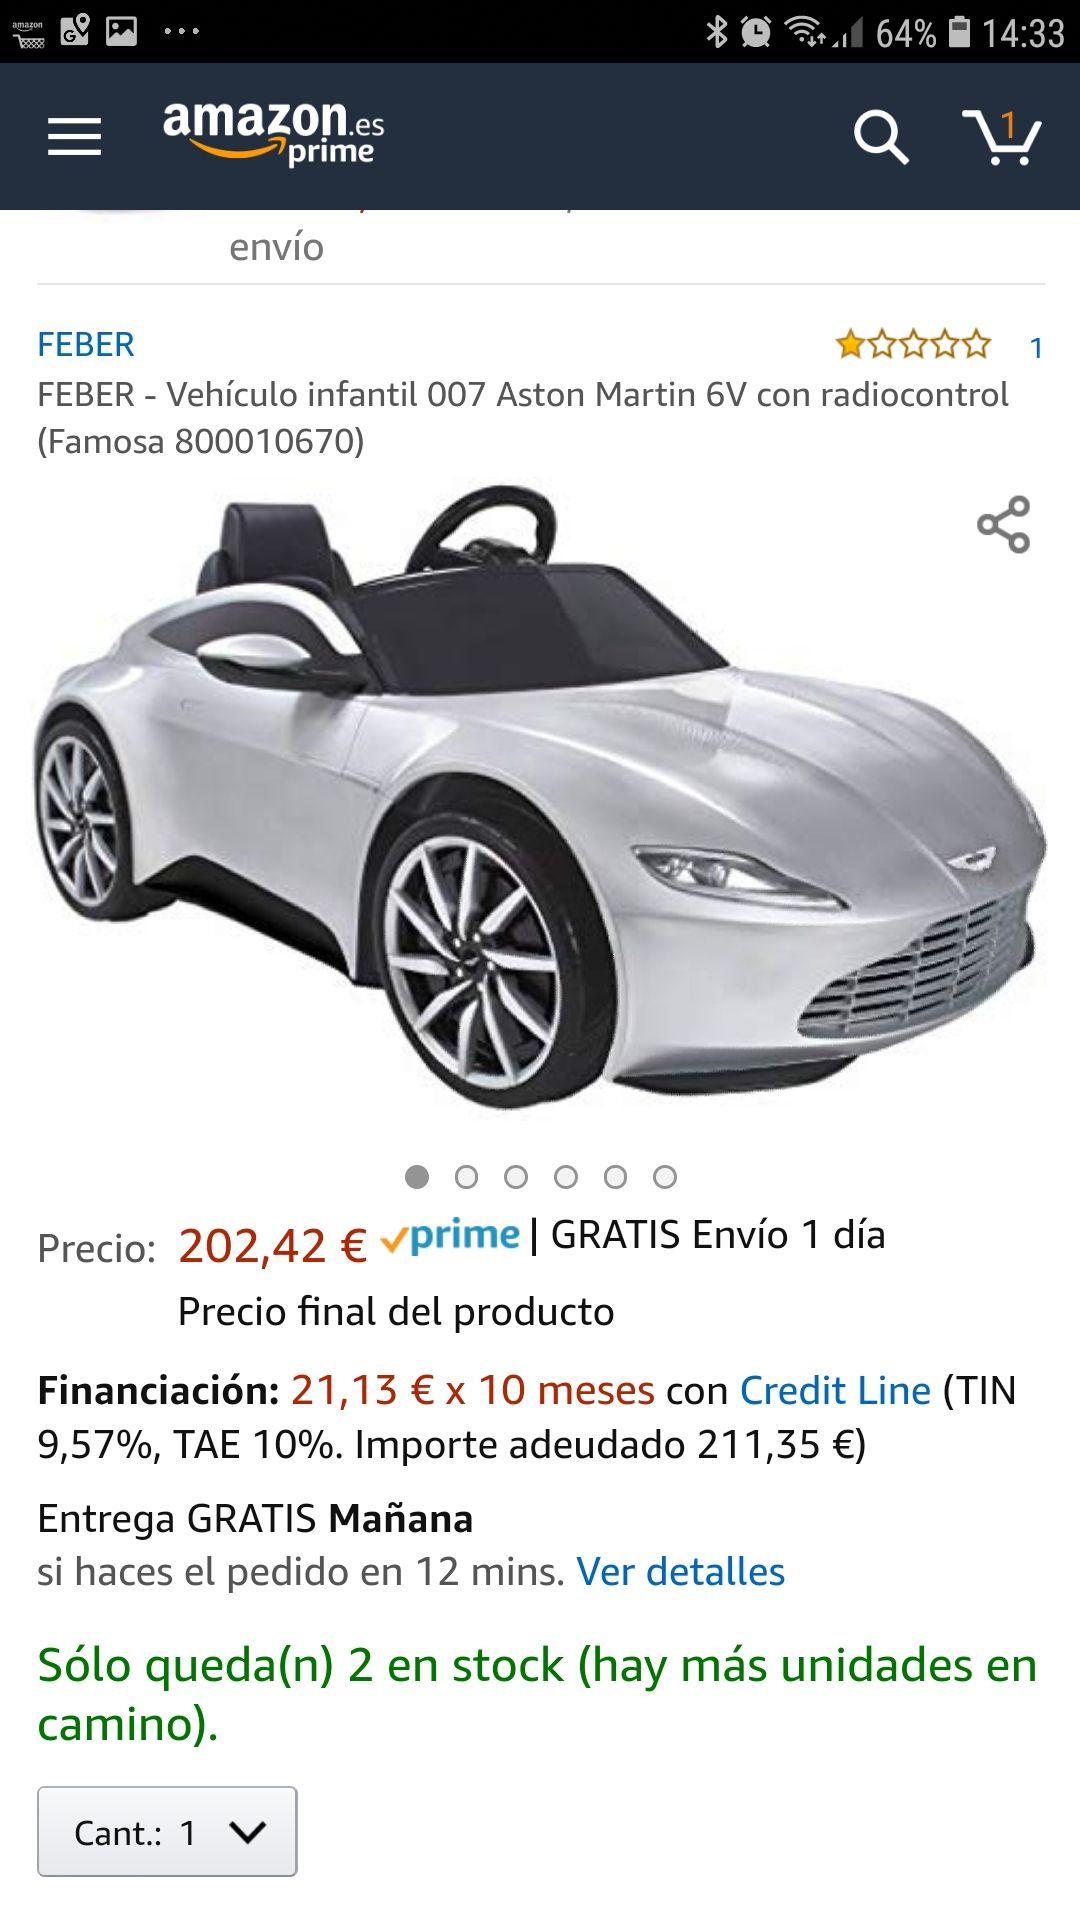 килим впечатление щит Aston Martin Costo Amazon Inspiria Interiors Com